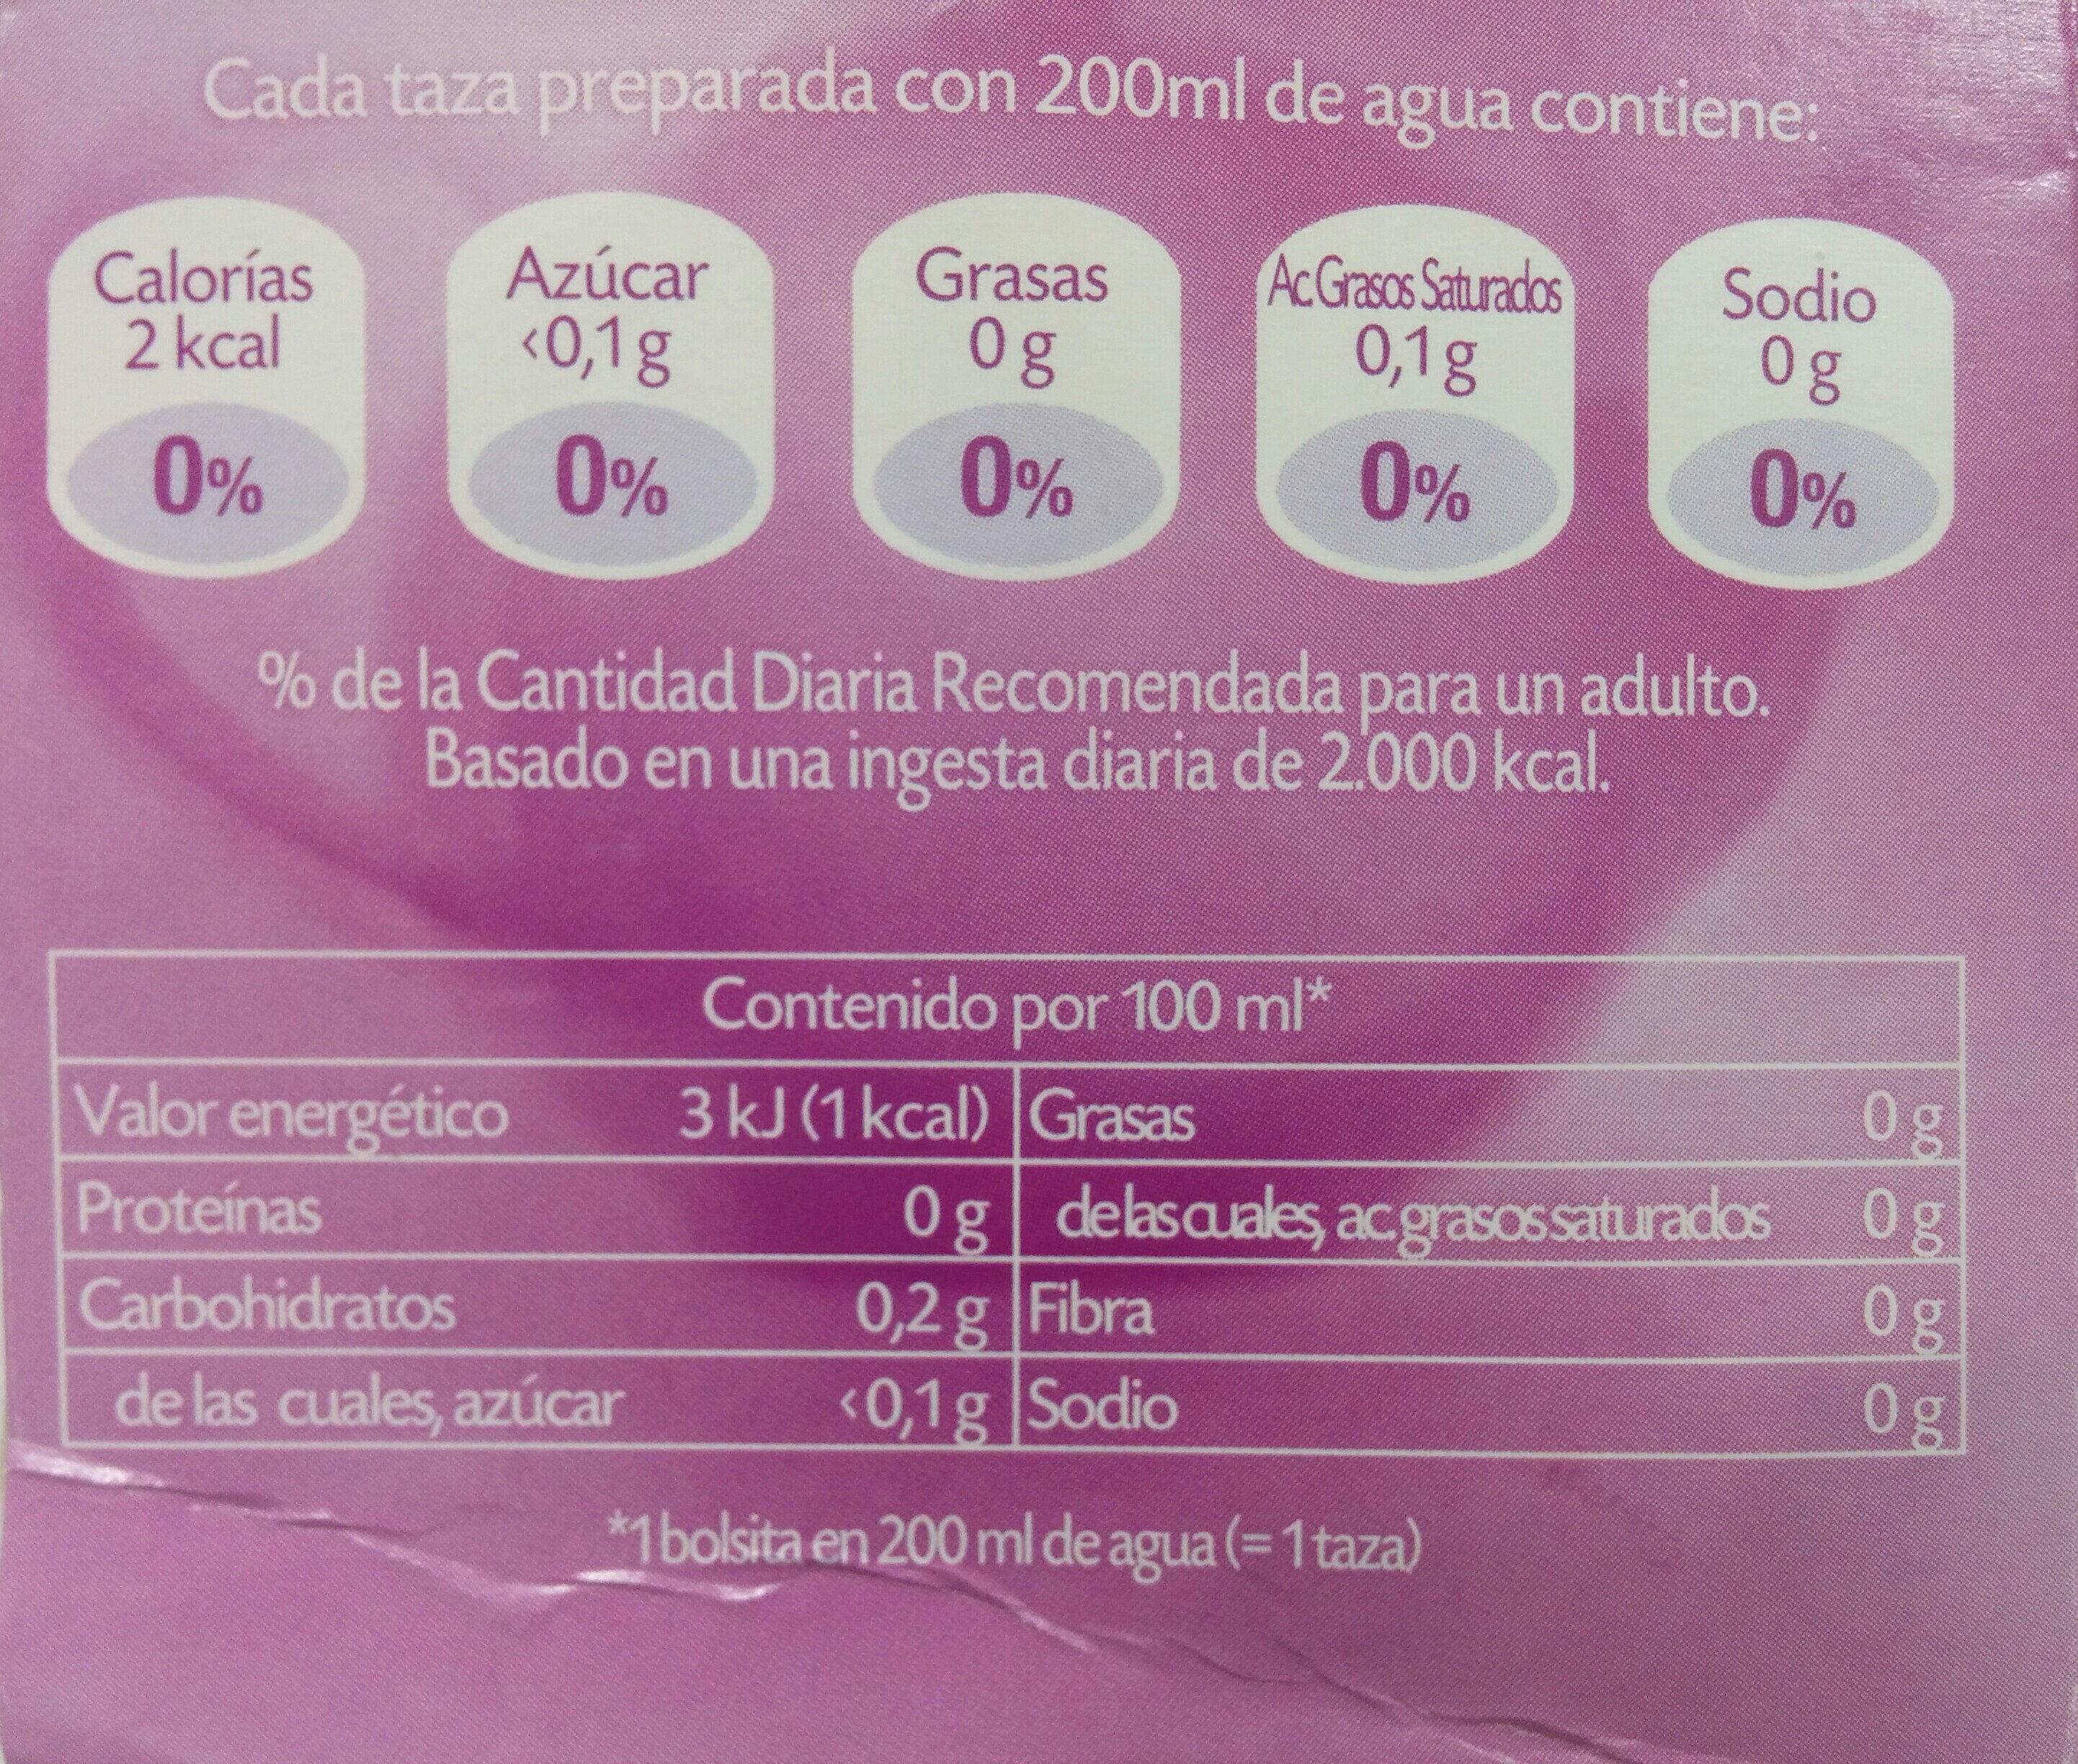 Equinacea plus 5 multinfusión - Voedingswaarden